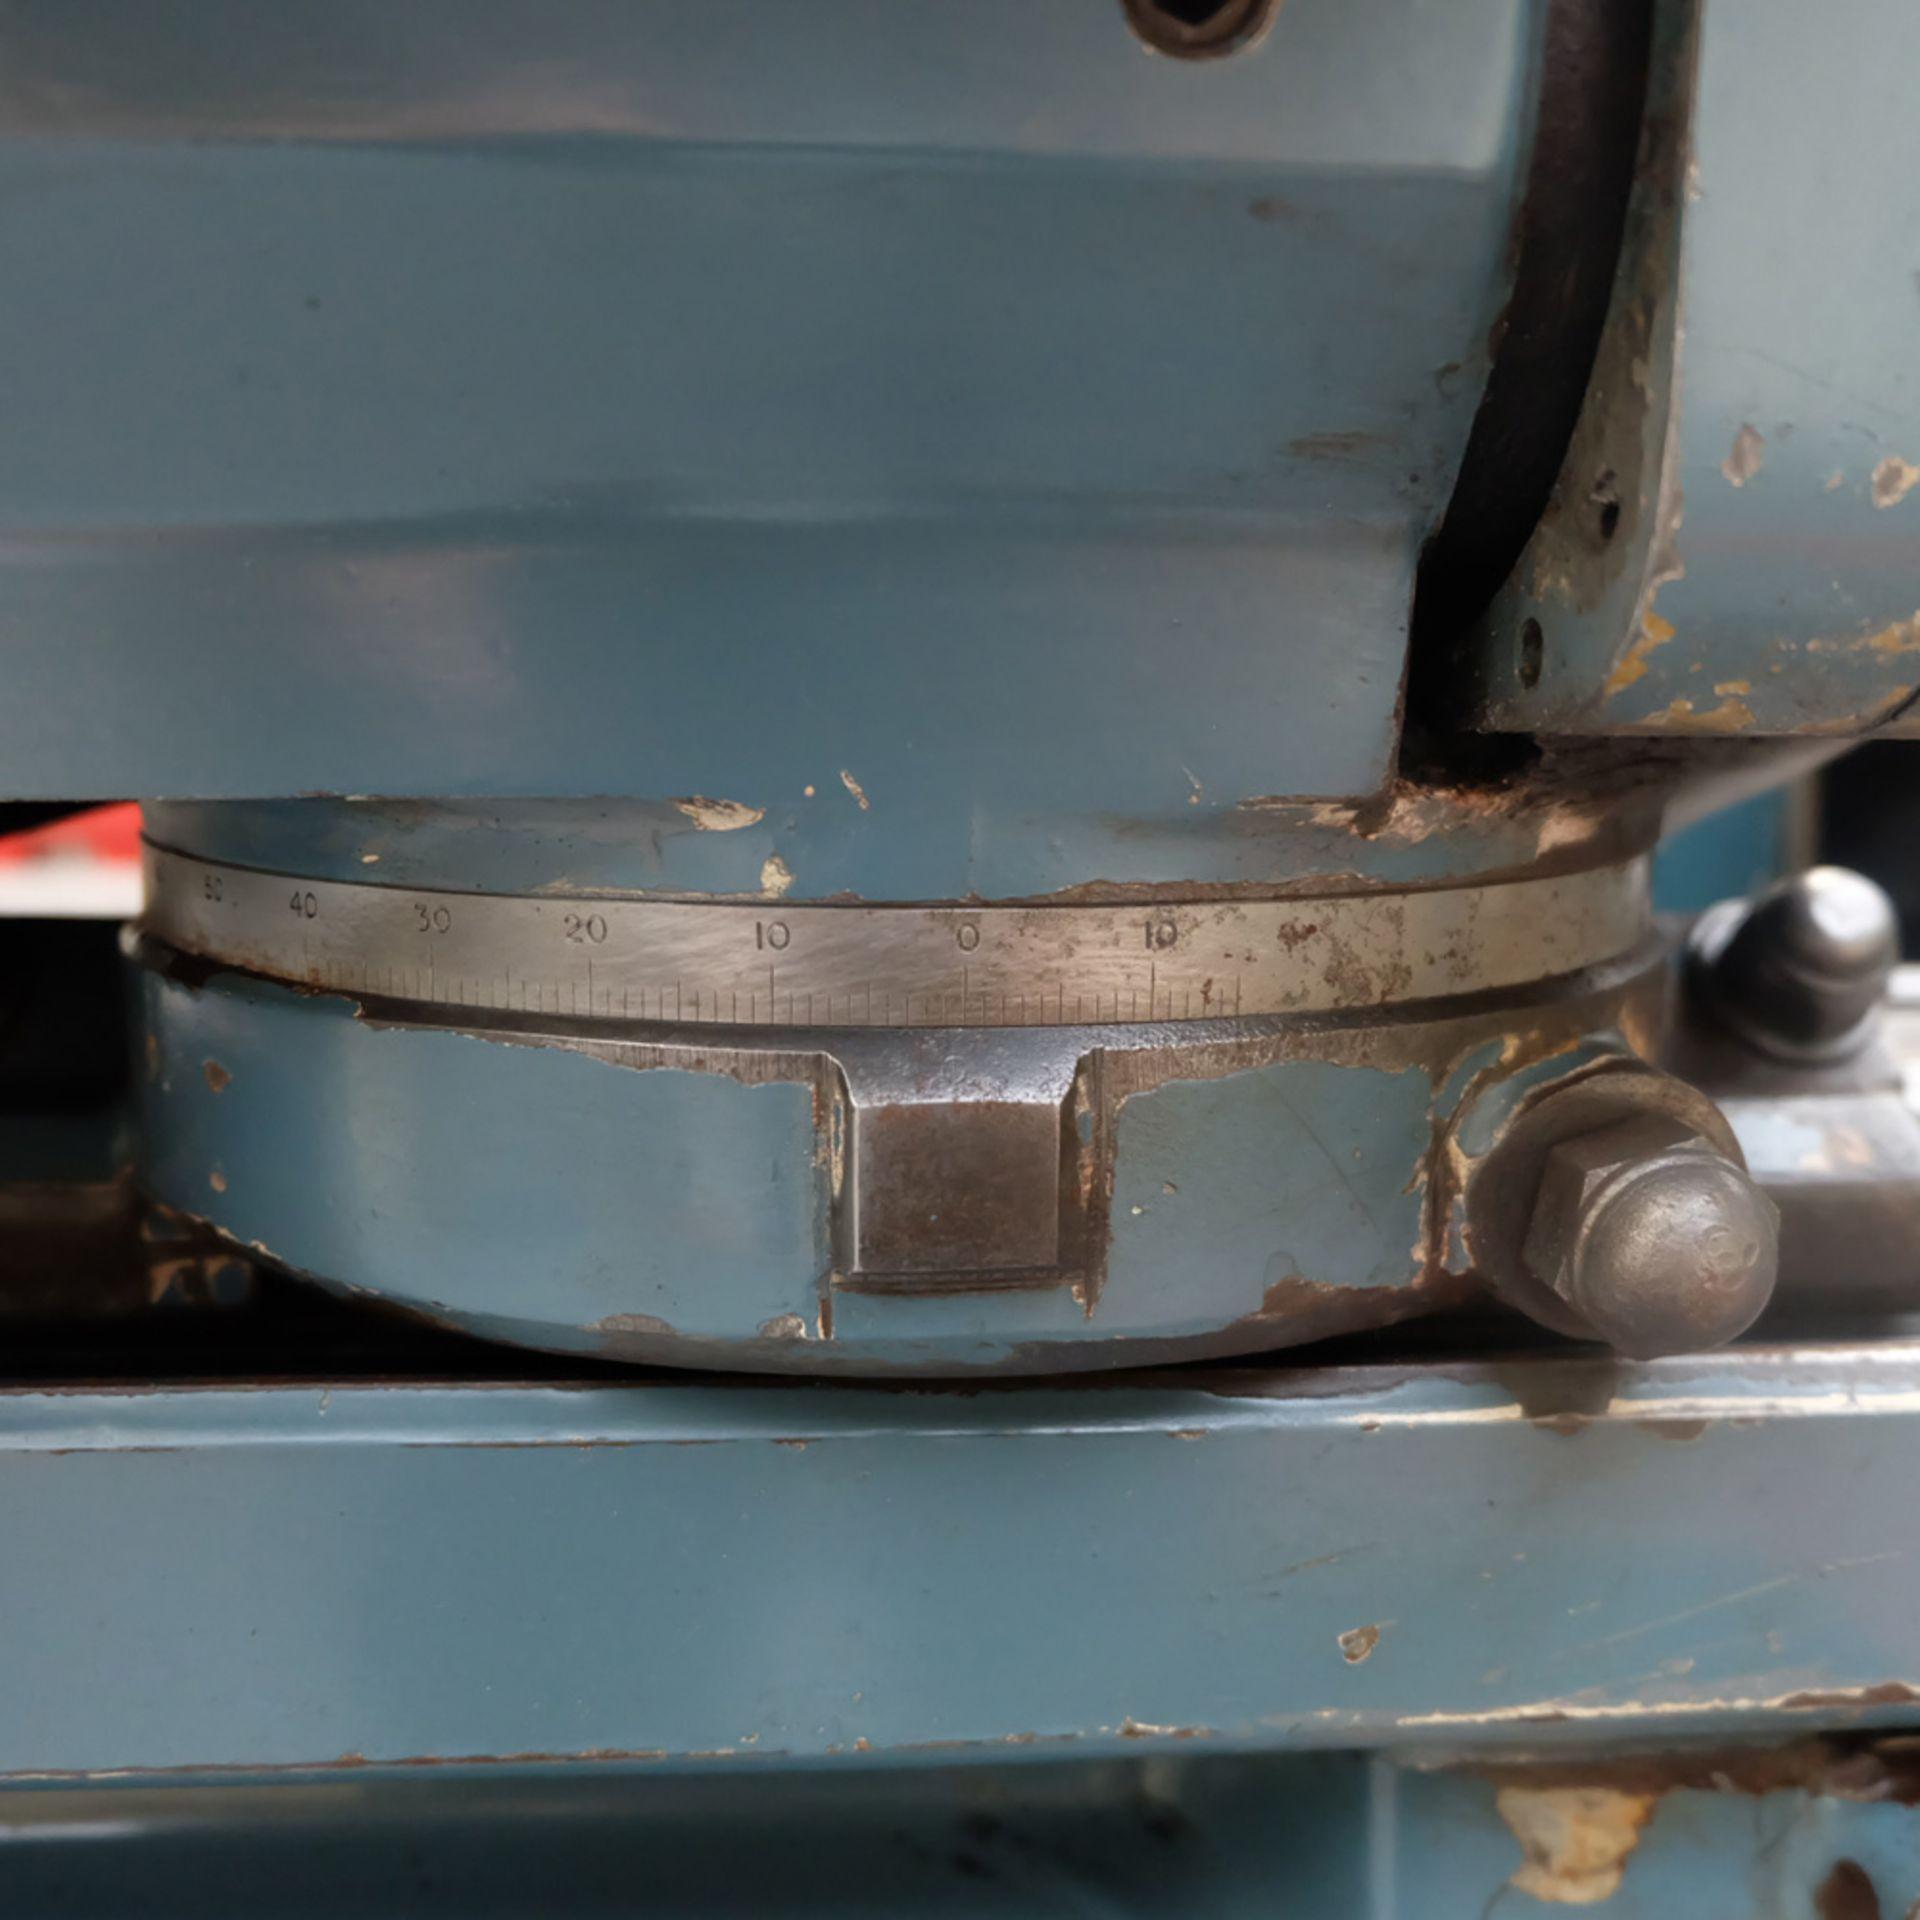 "Jones & Shipman Model 1311 EIU Universal Cylindrical Grinder. Capacity 18"" x 10"". - Image 11 of 12"